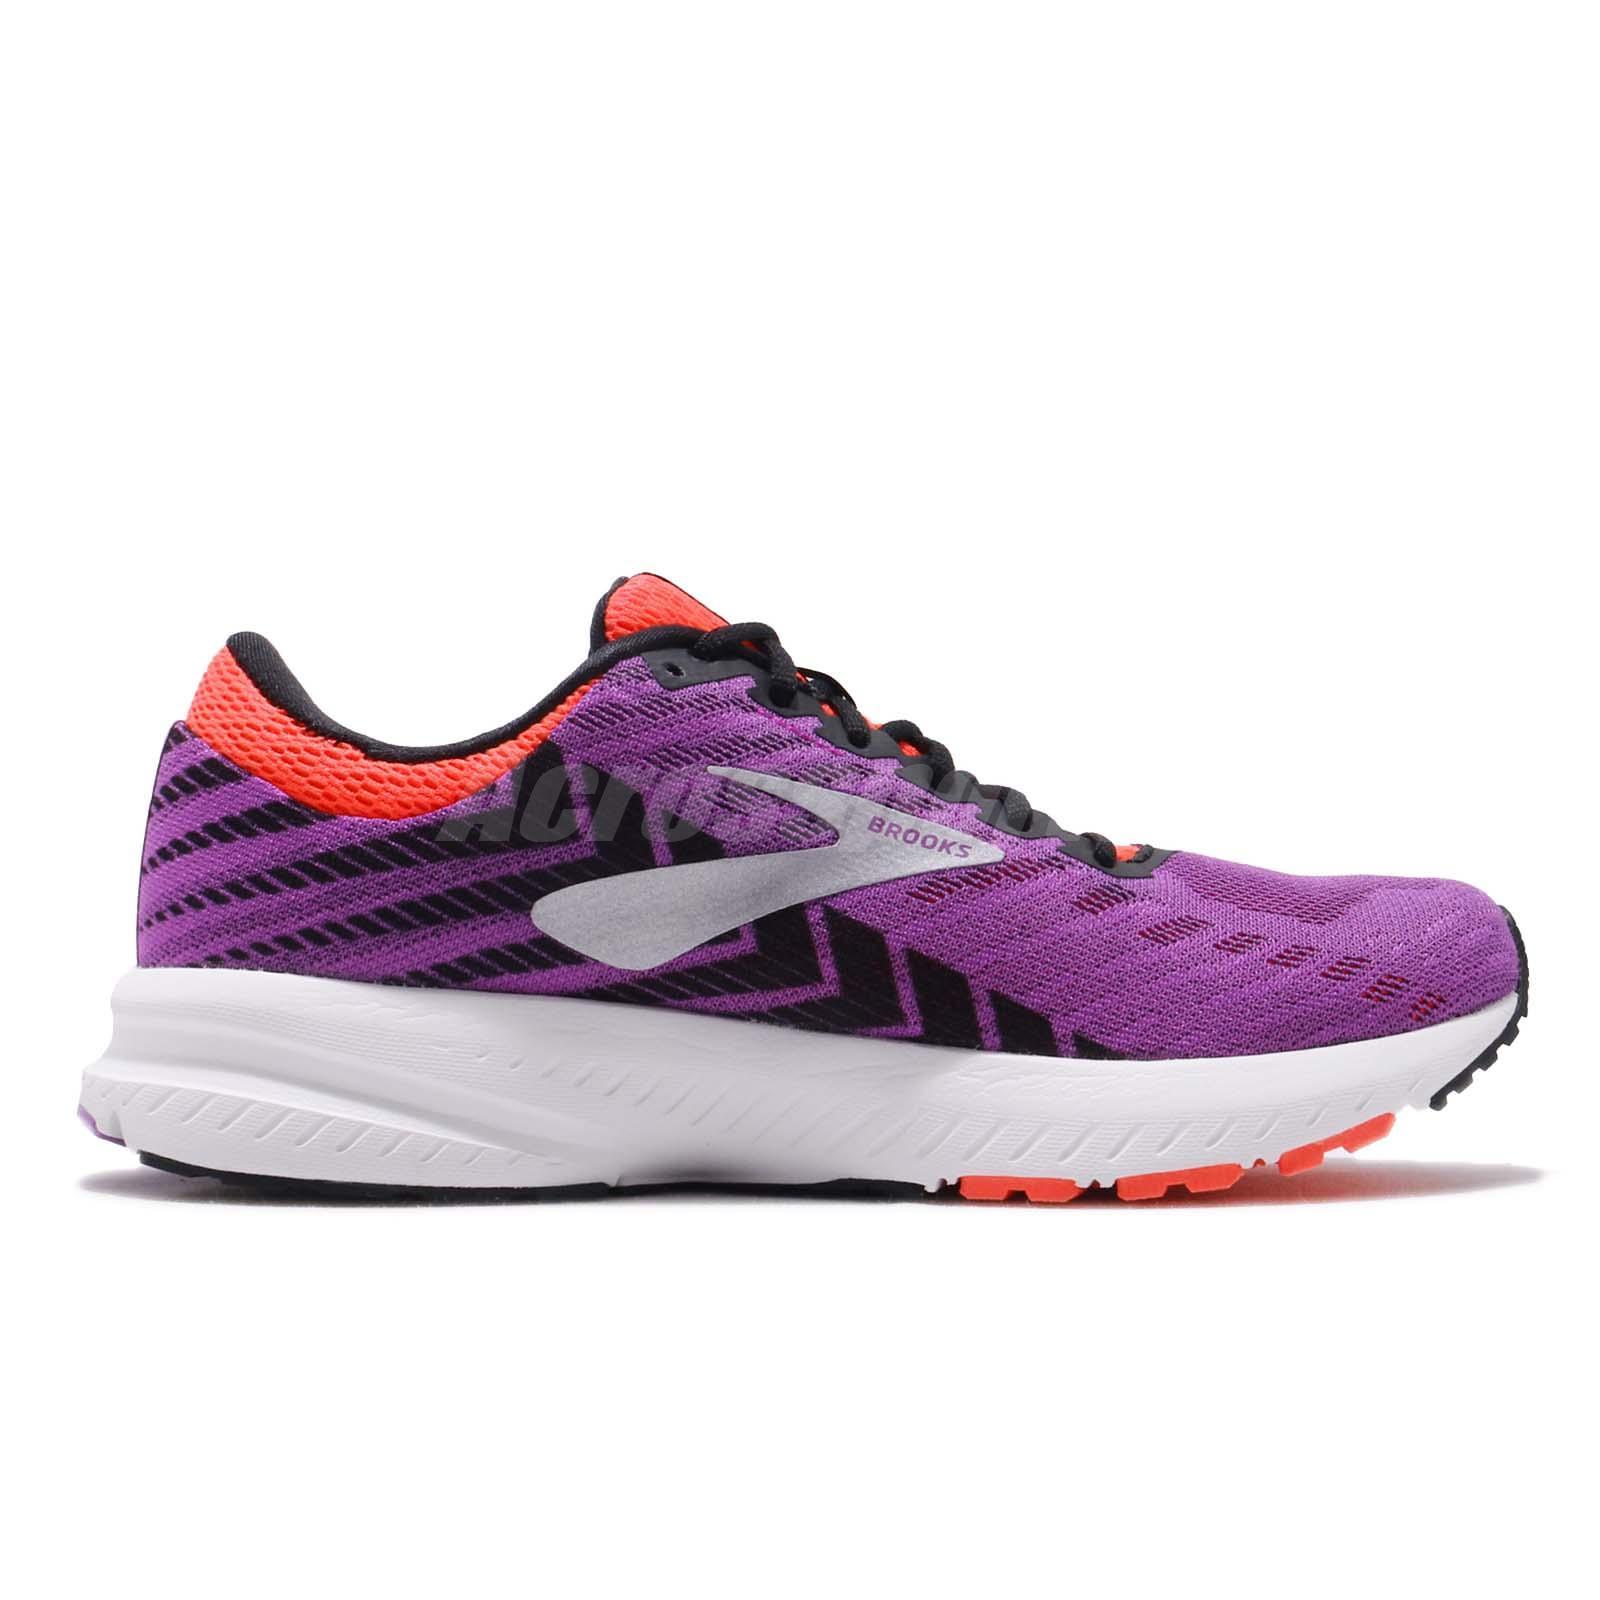 7d9c2ecd11539 Brooks Launch 6 Purple Black Coral White Women Running Shoes ...